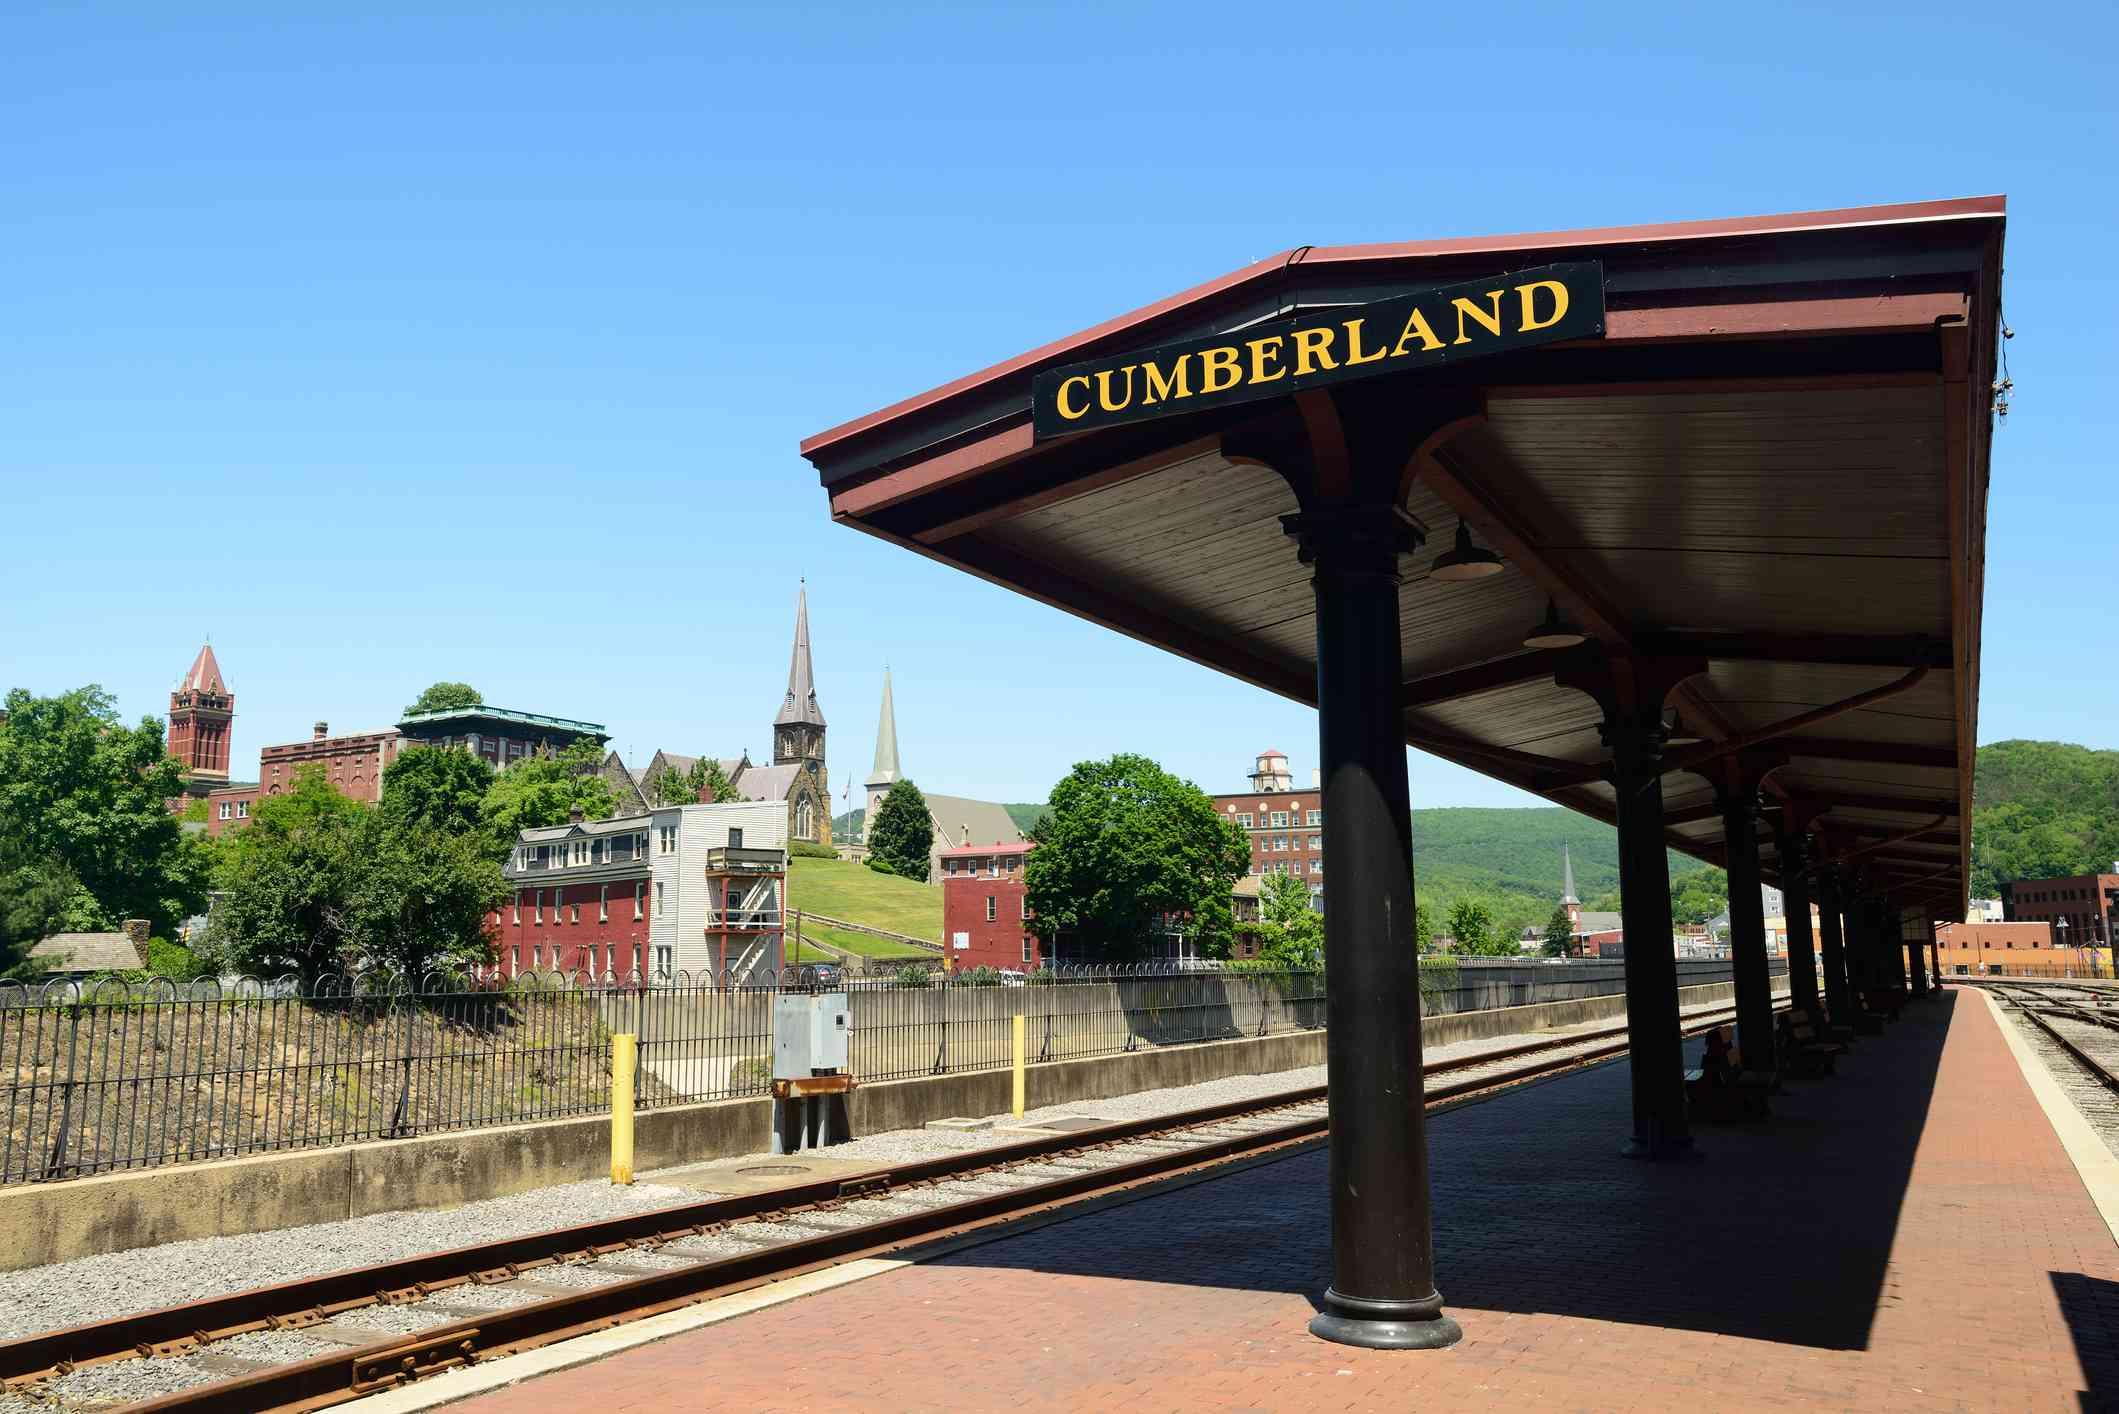 Western Maryland Railway Station in Cumberland